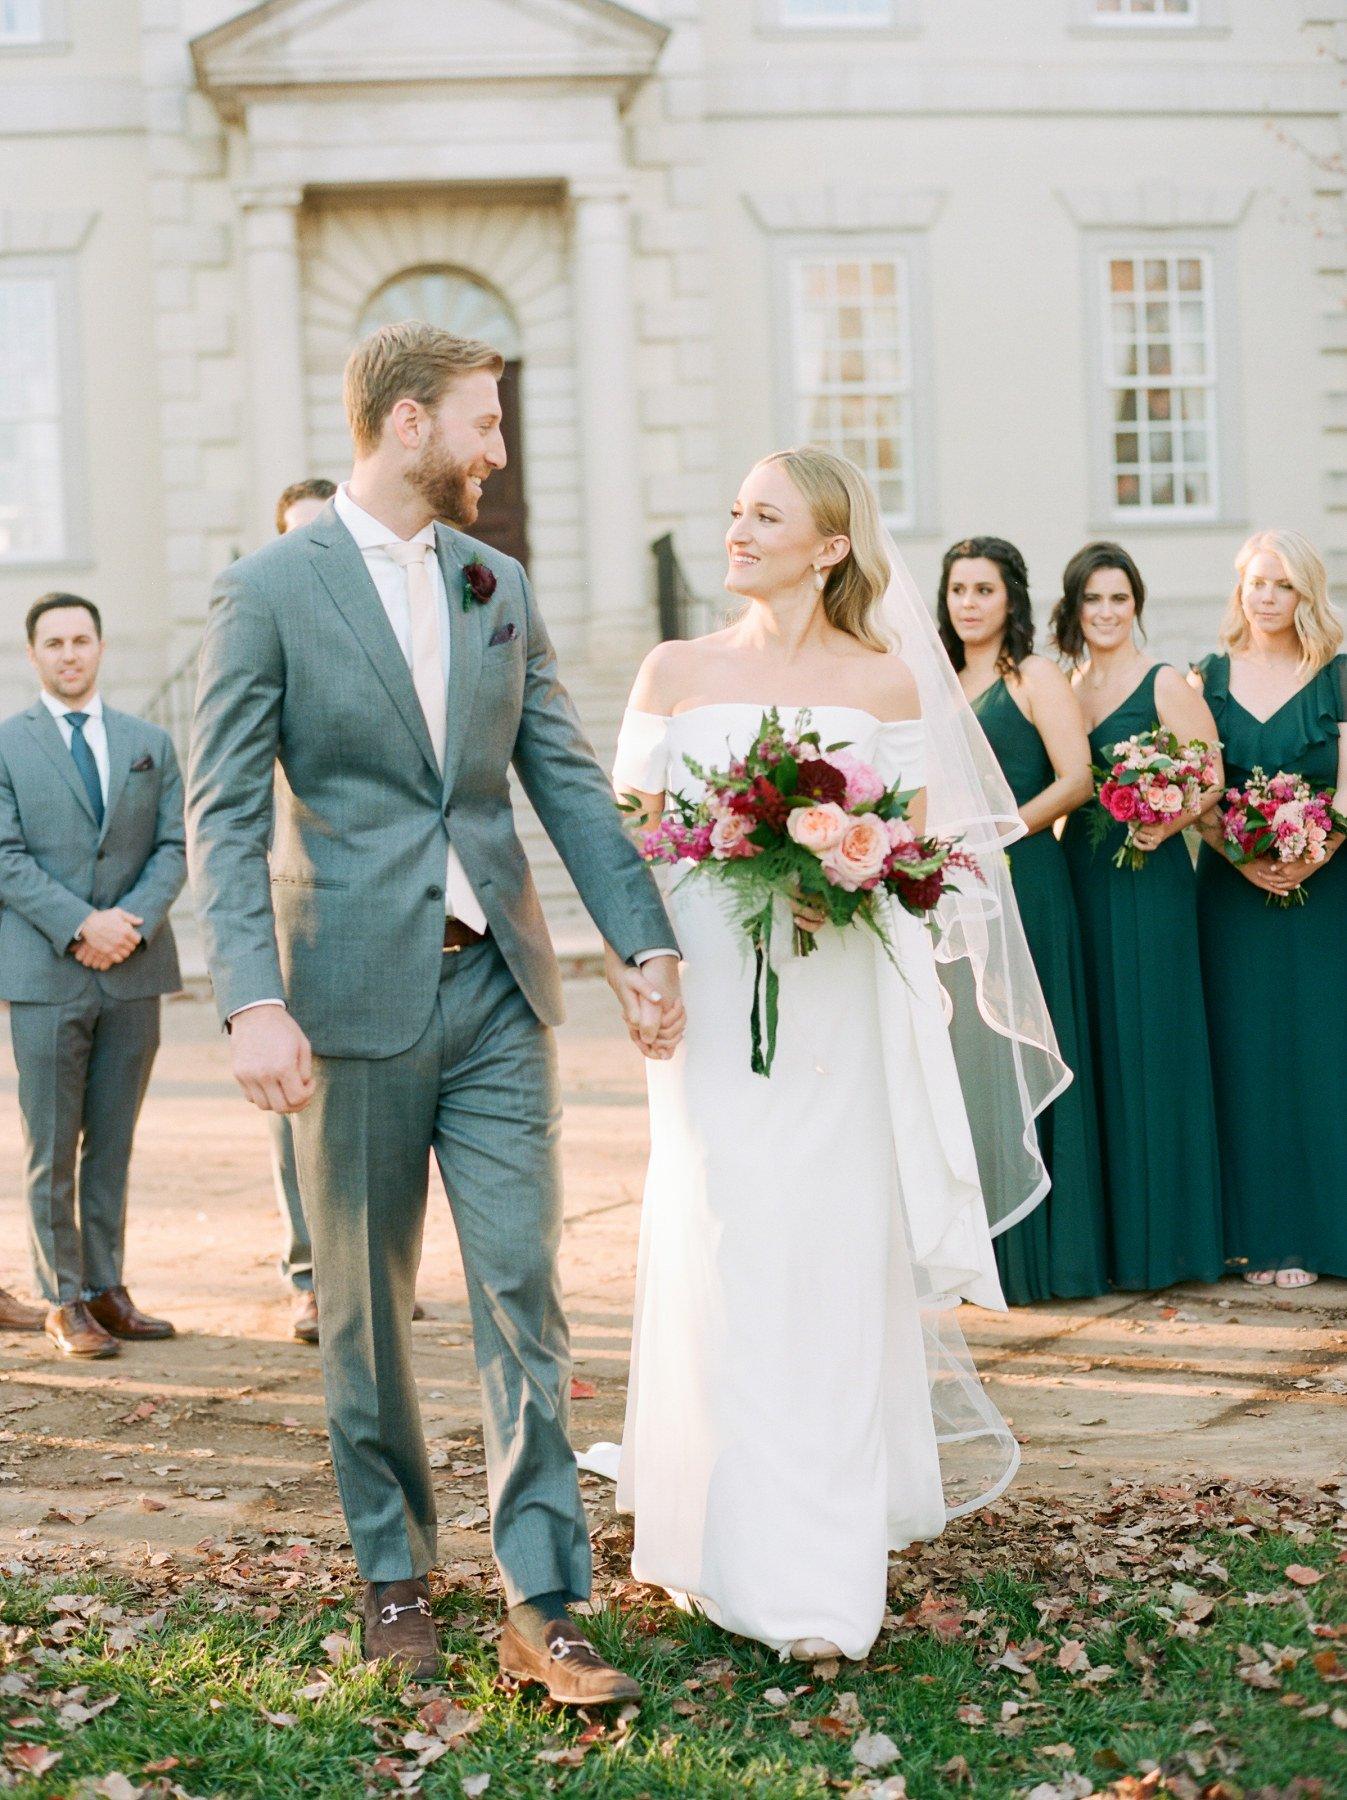 42Great_Marsh_Estates_Wedding_Anne_Kelley_Events_Astrid_Photography146486130009-2